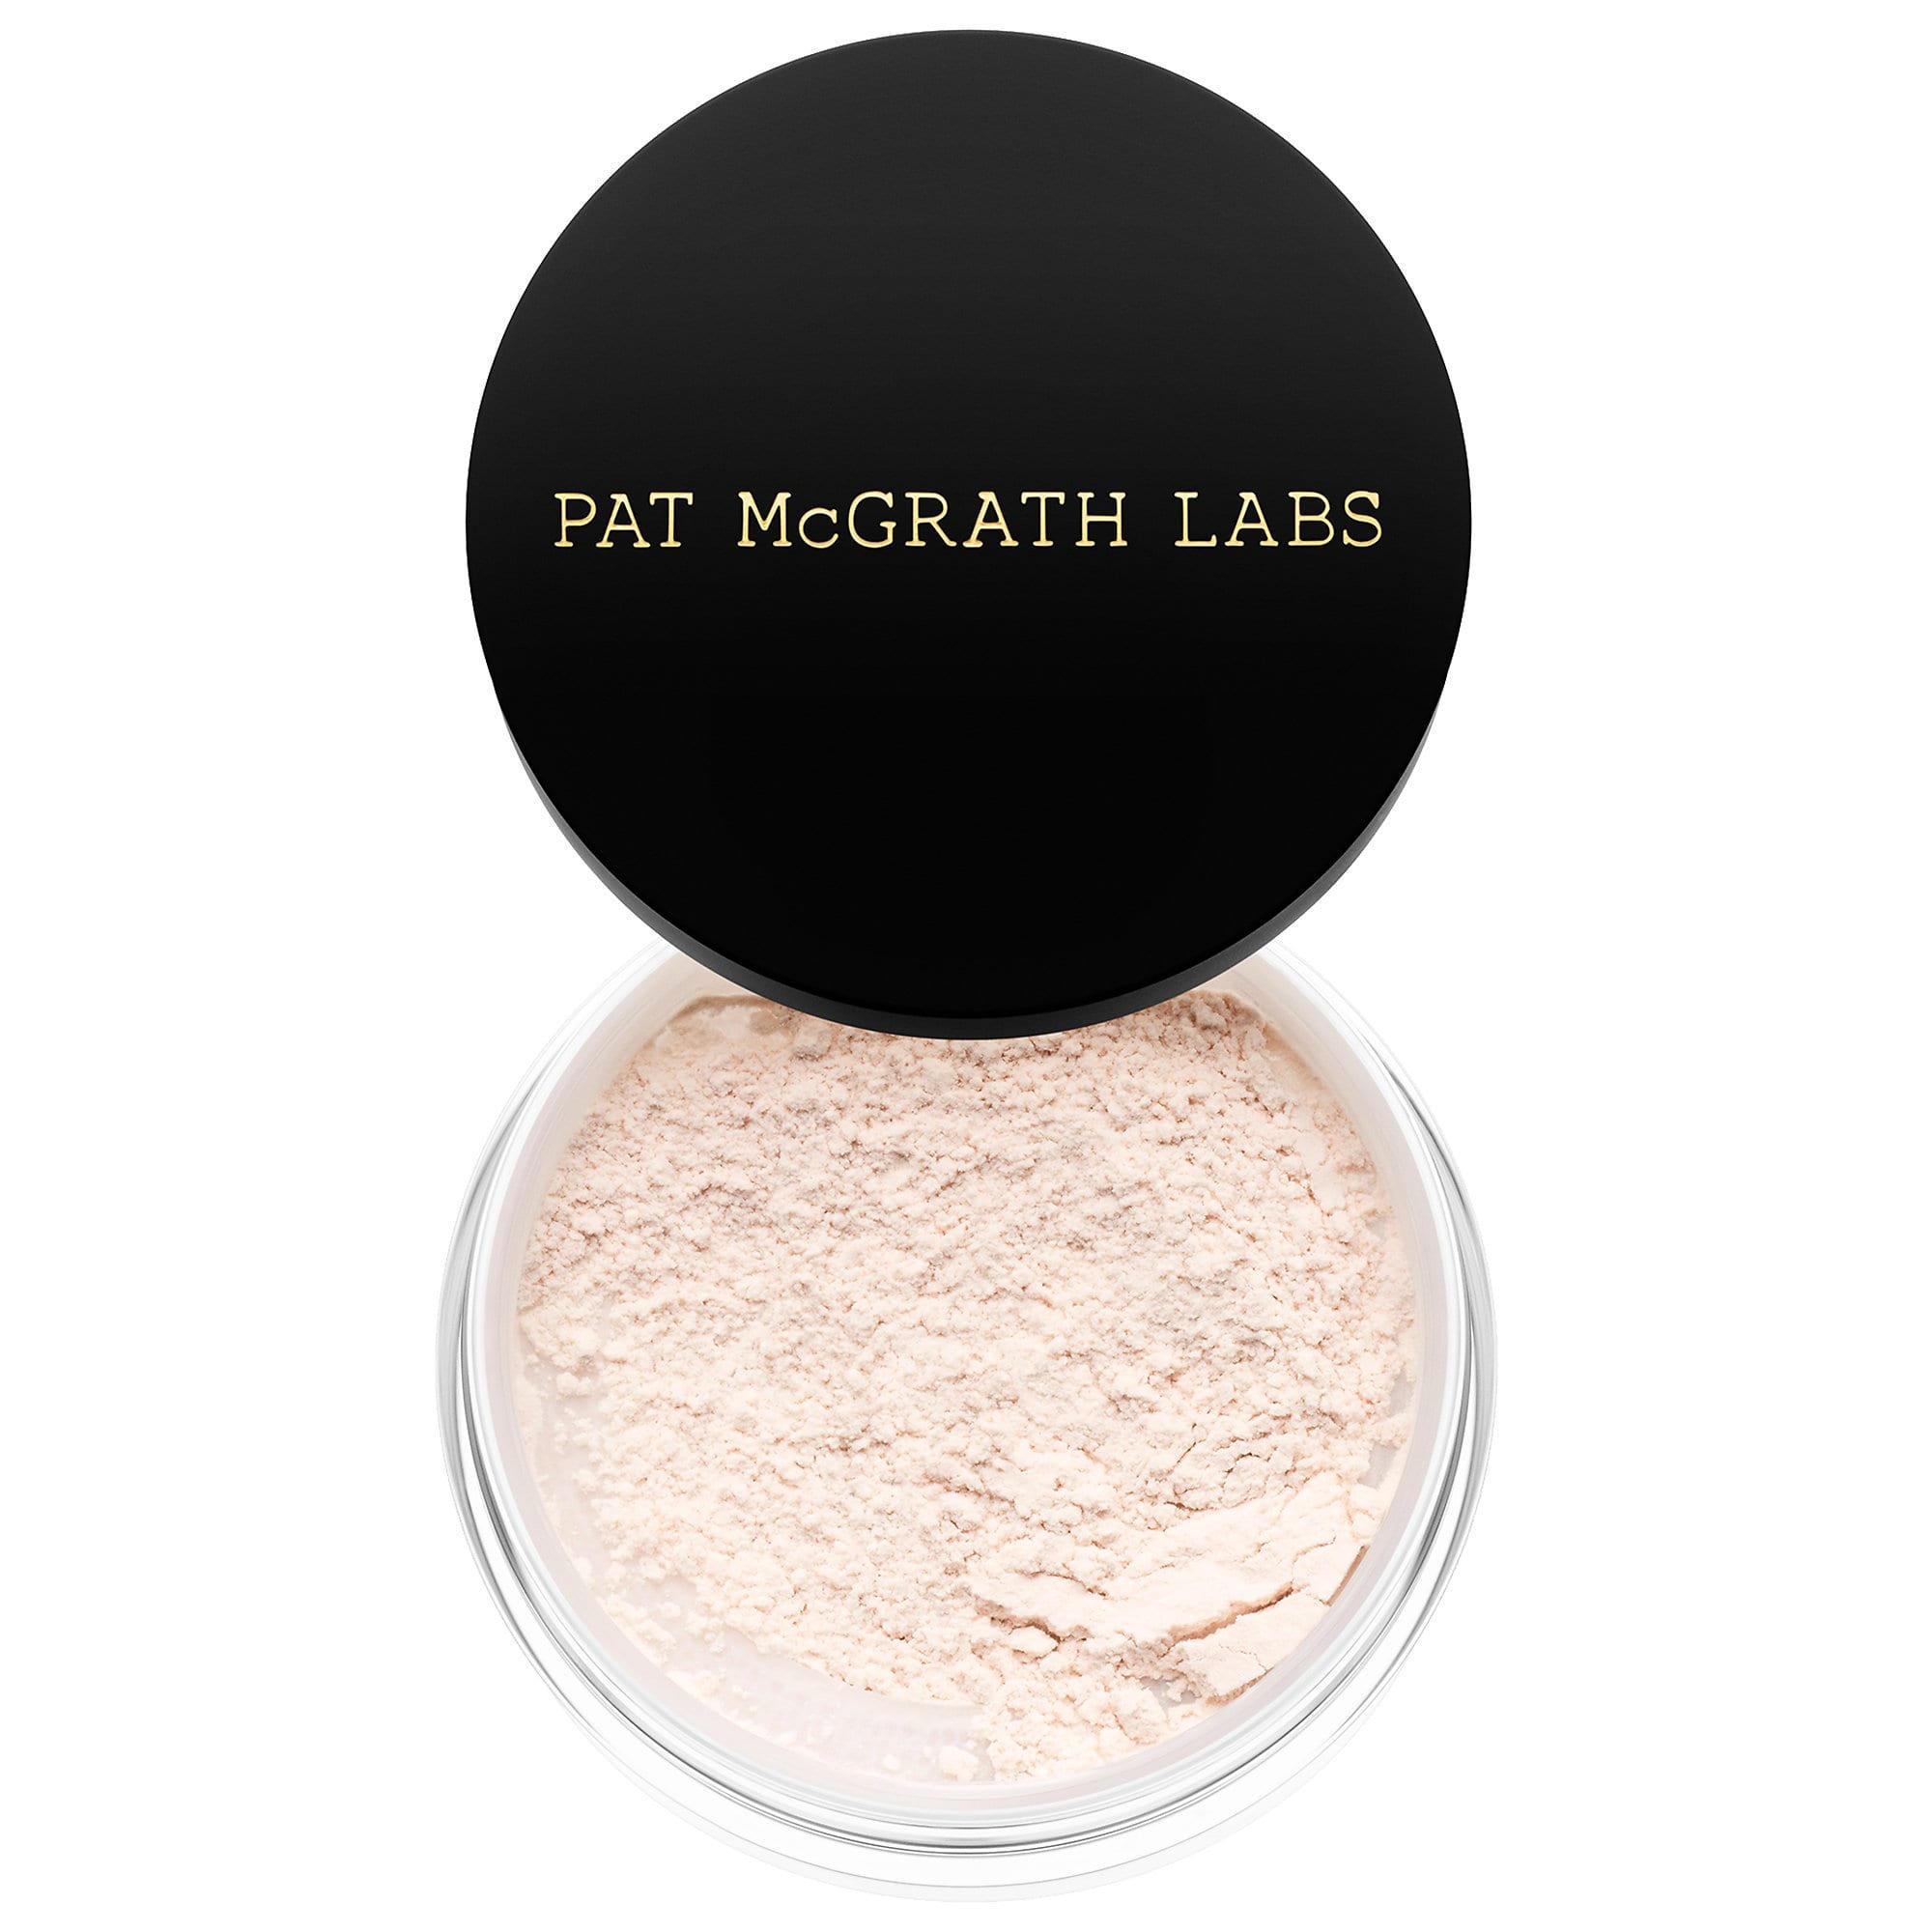 Pat Mcgrath Labs Skin Fetish: Sublime Perfection Setting Powder Light 1